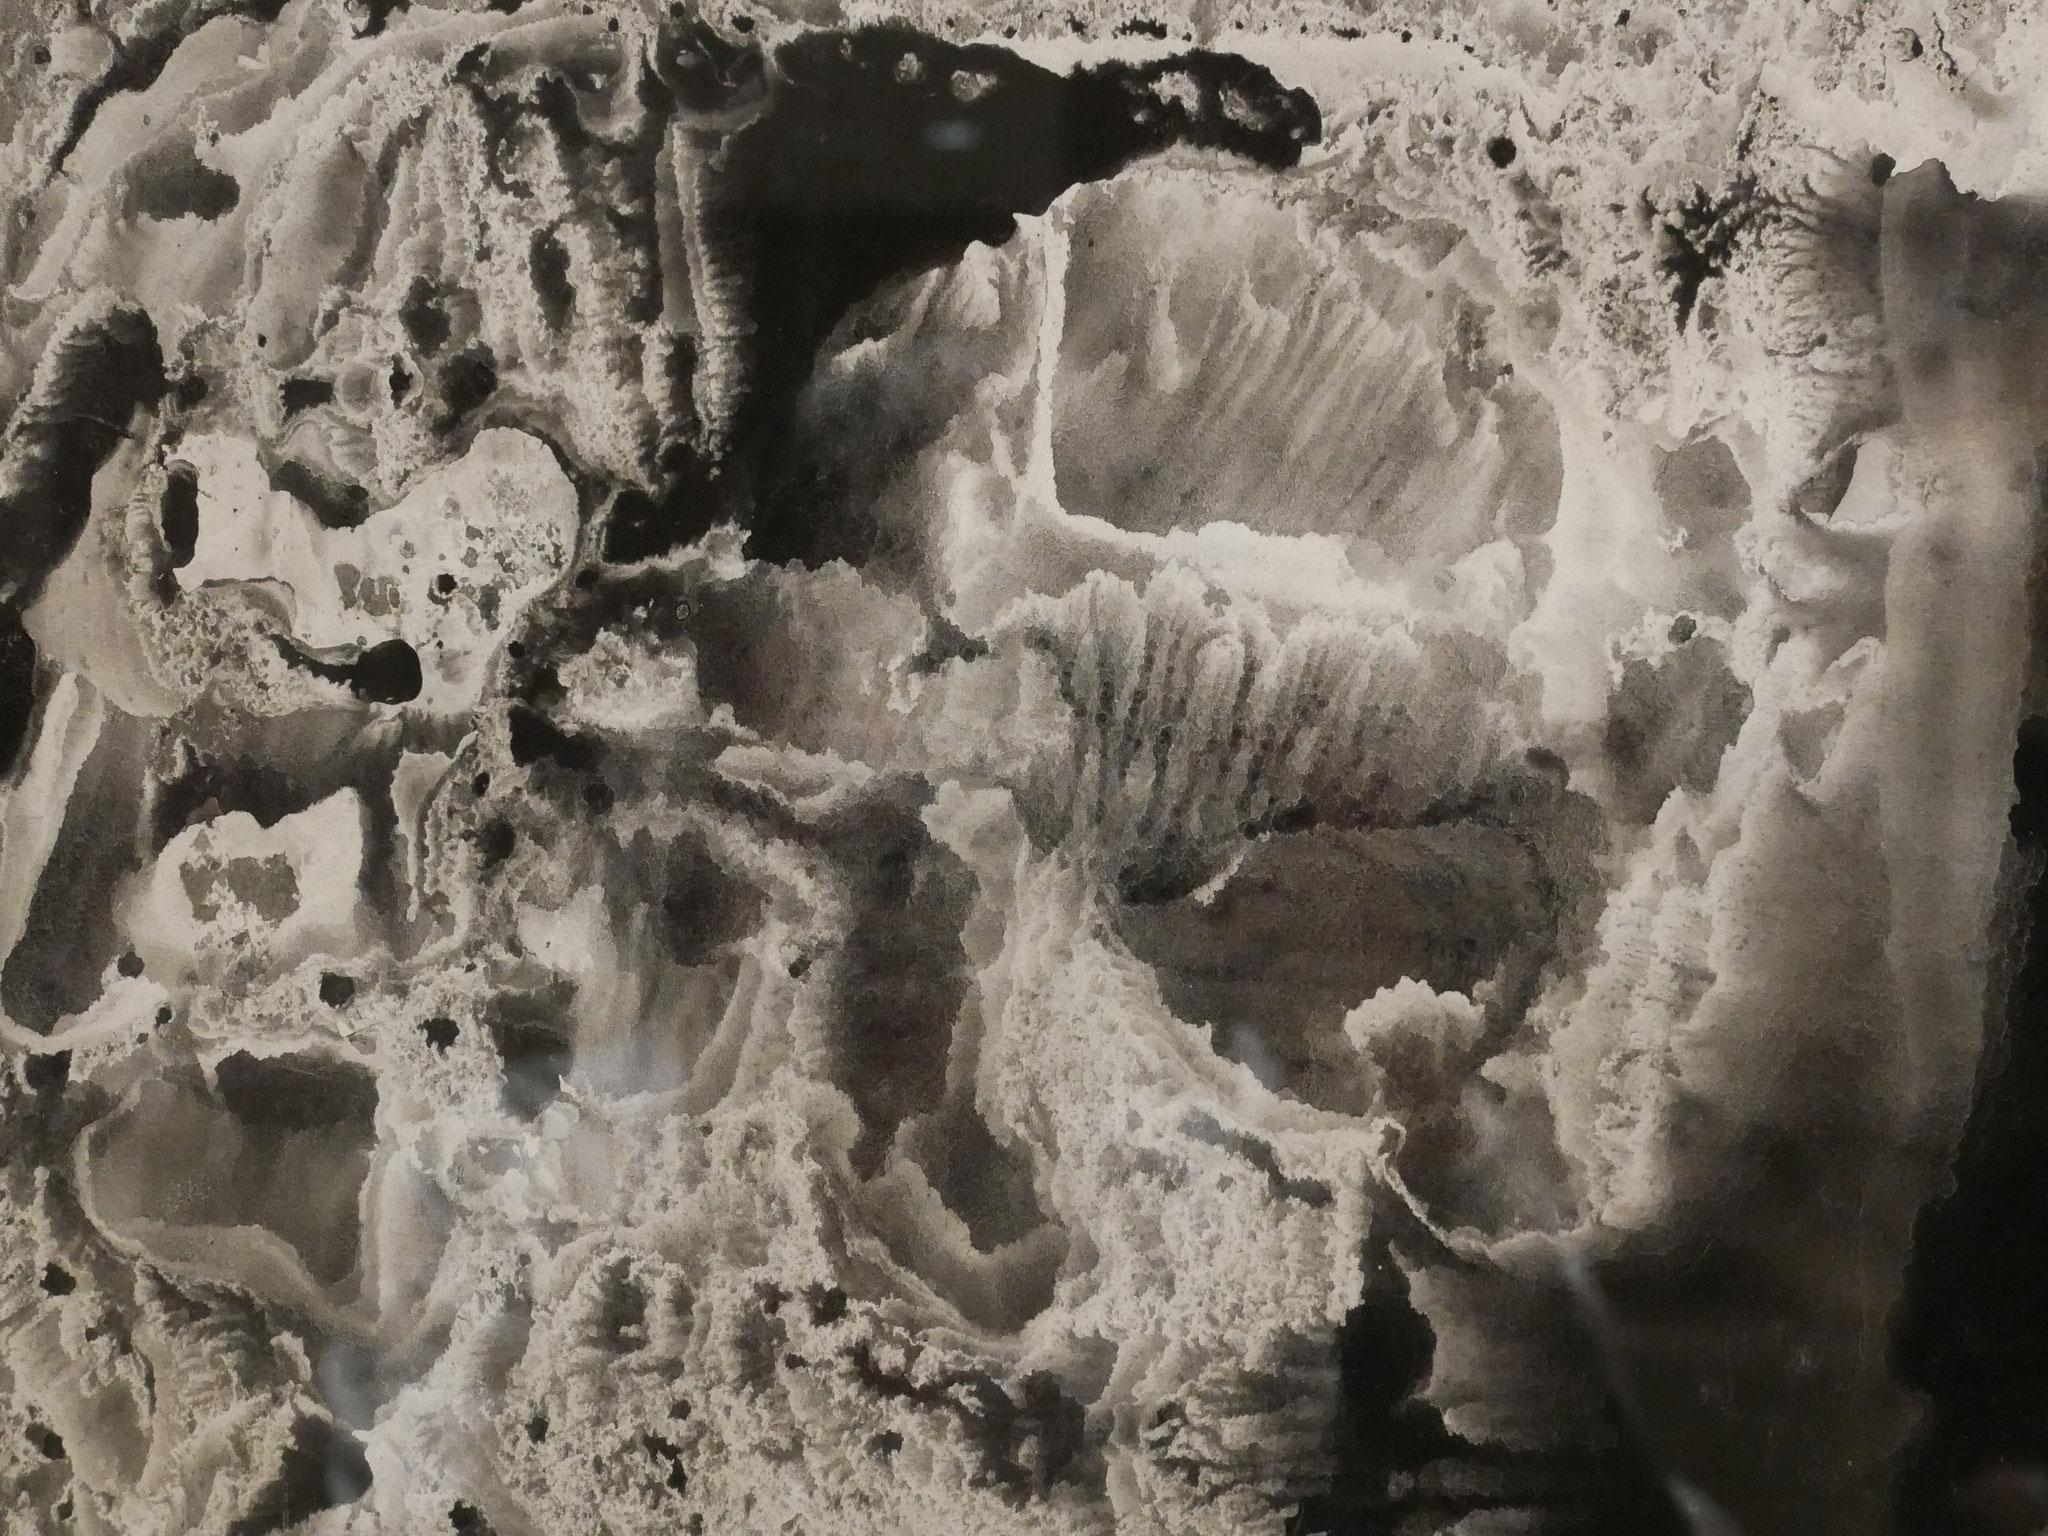 André Breton, Untitled, 1935